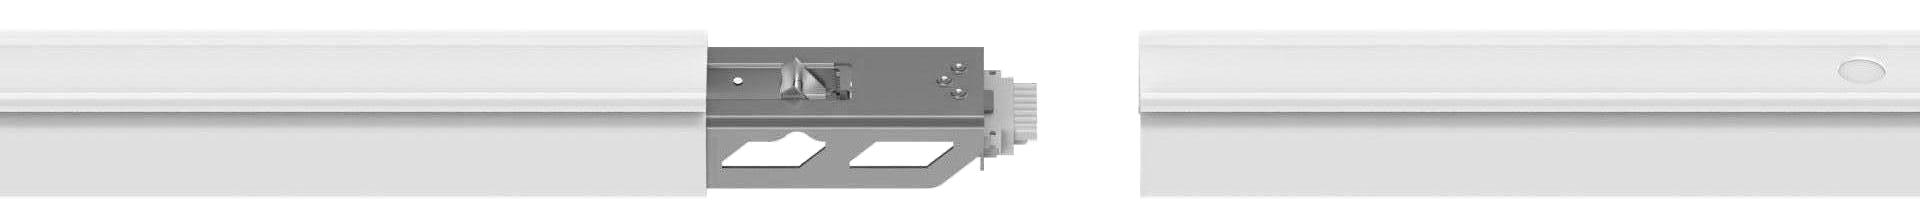 LED-Lichtband-Komplettsystem LSL-06 selbstsichernde Steckverbindung